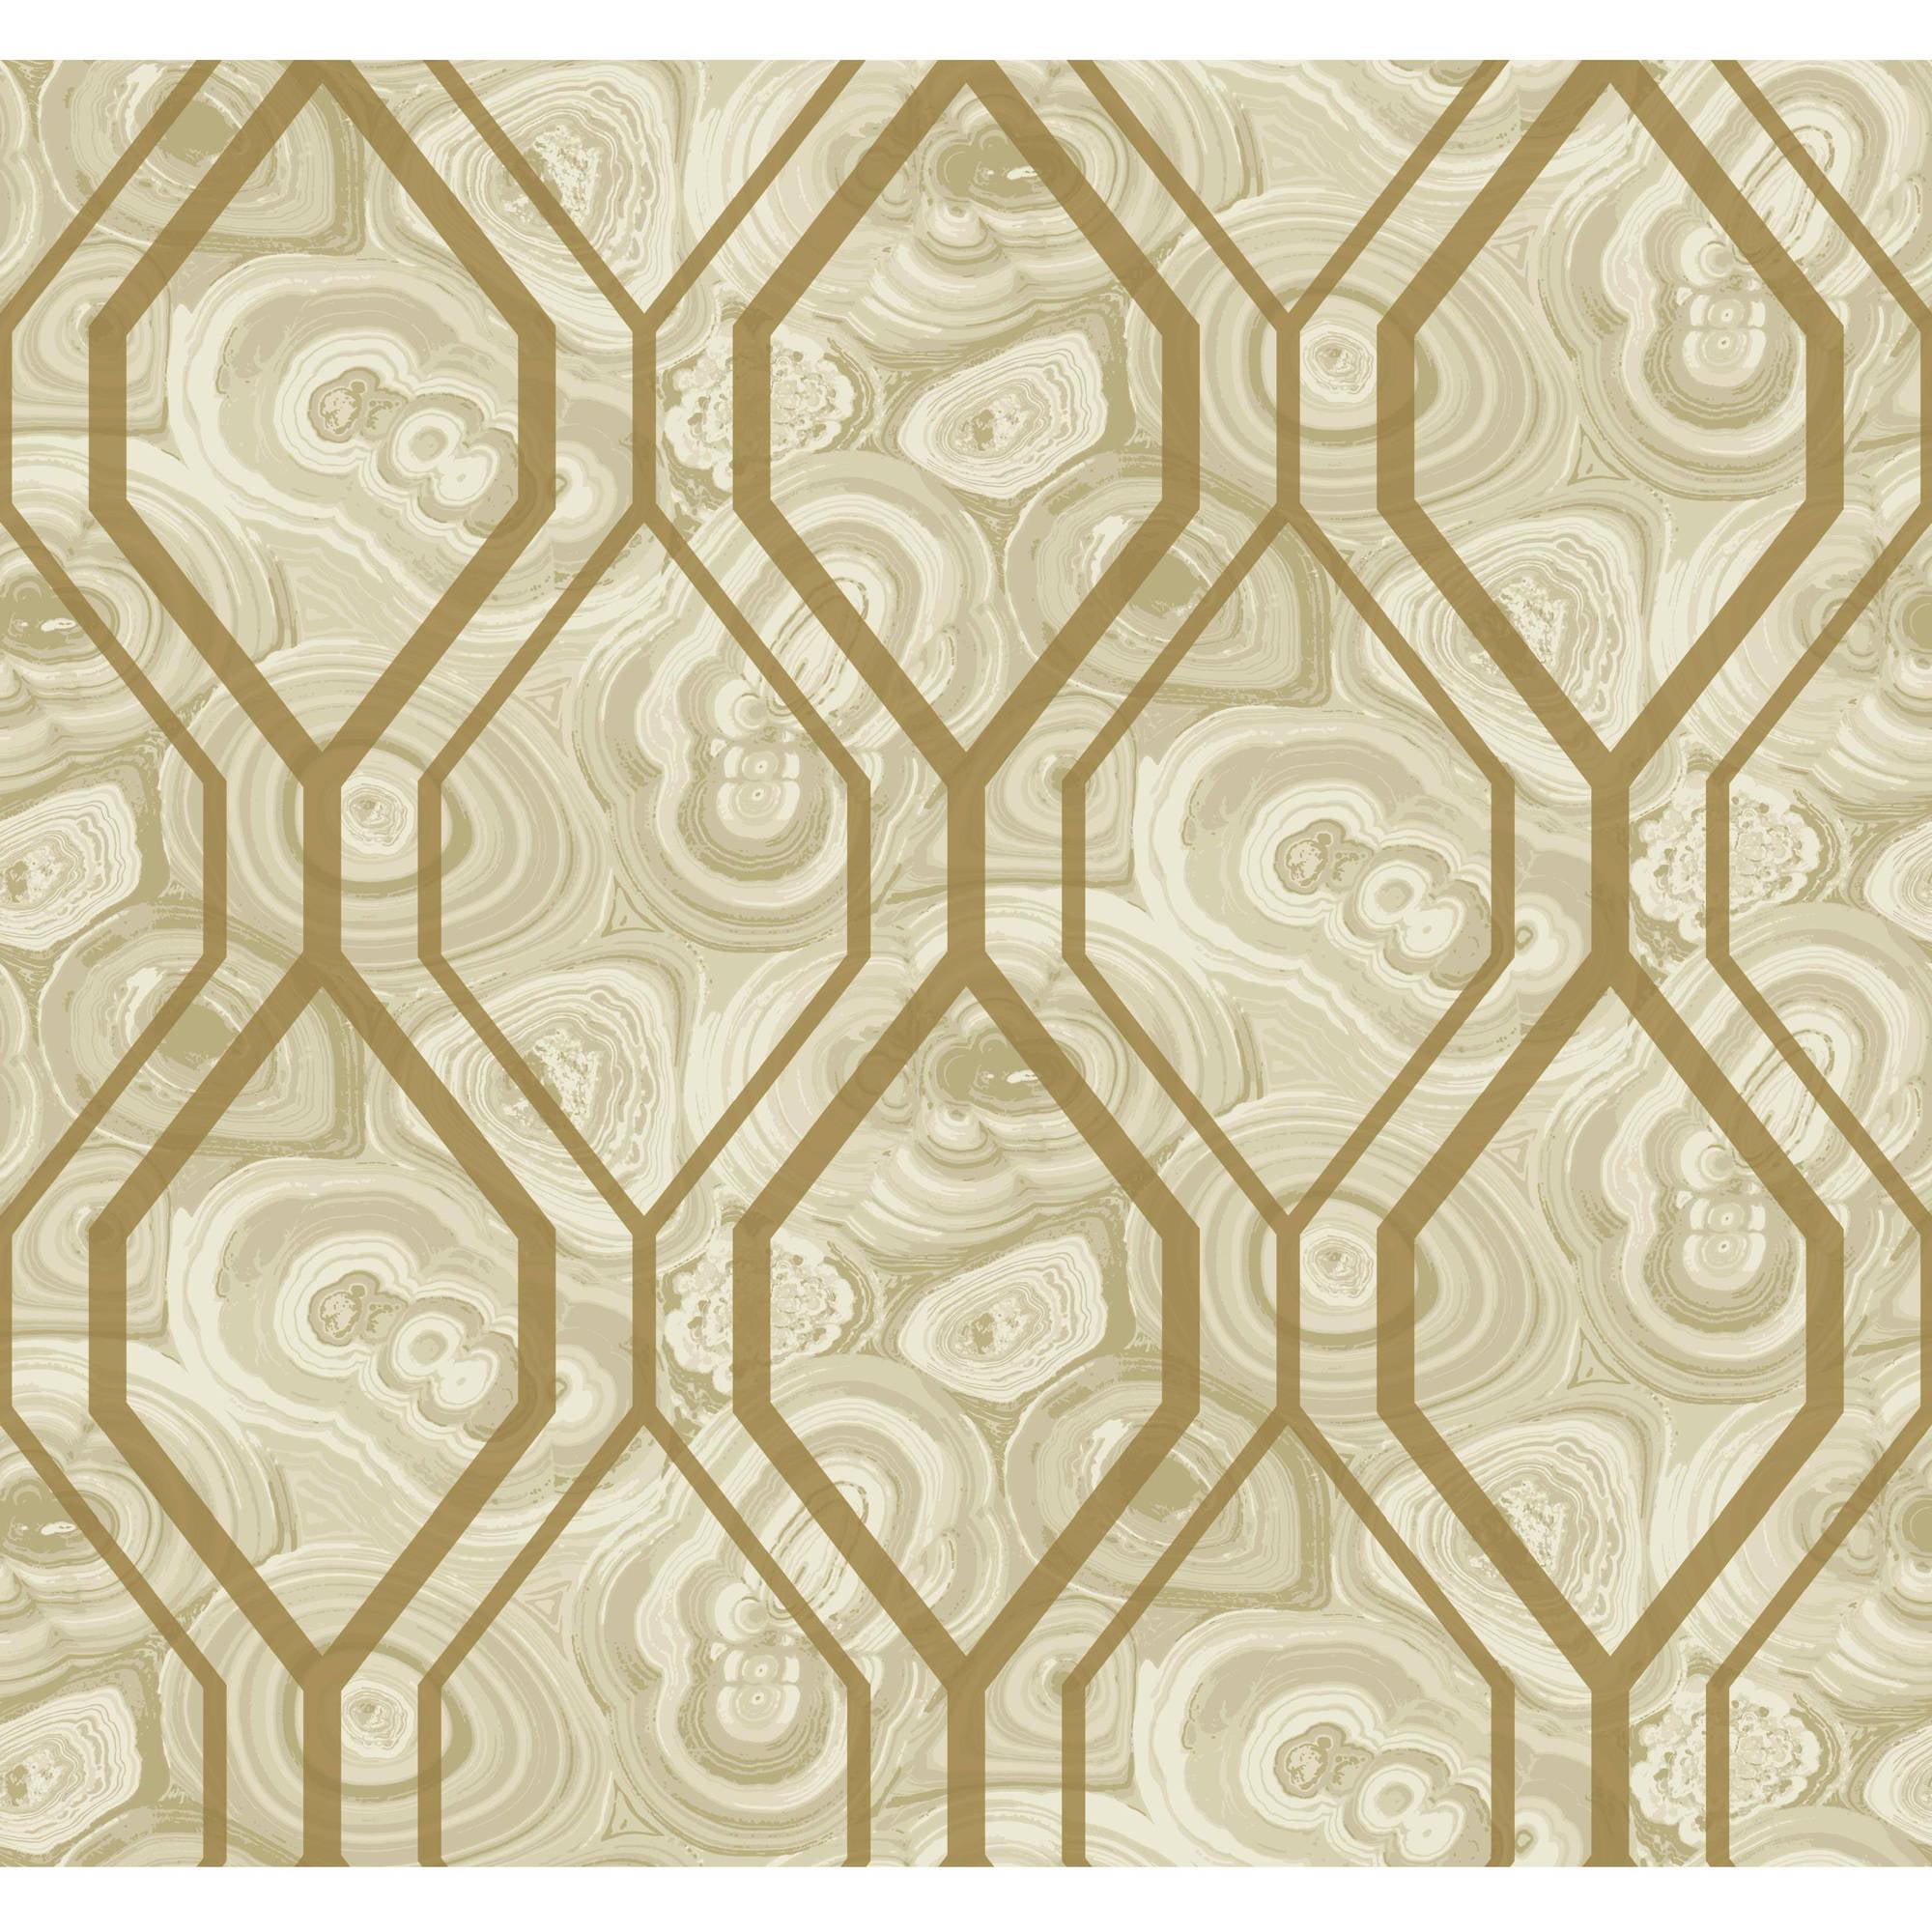 Malachite Trellis Wallpaper